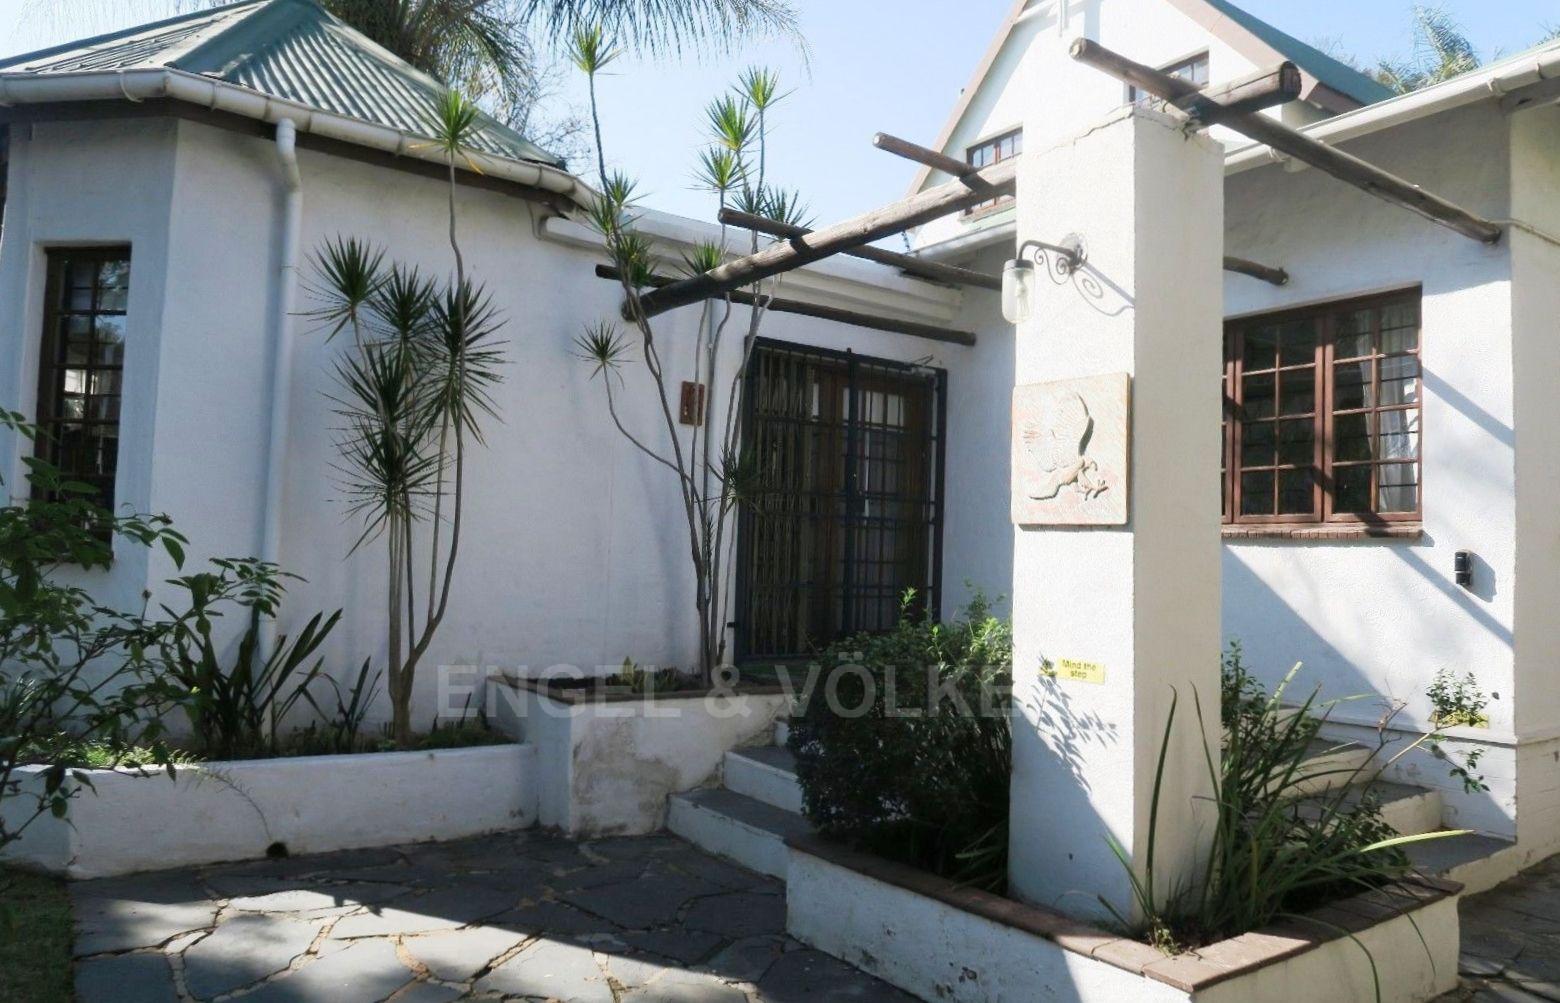 Pretoria, Menlo Park Property  | Houses For Sale Menlo Park, MENLO PARK, House 3 bedrooms property for sale Price:3,750,000